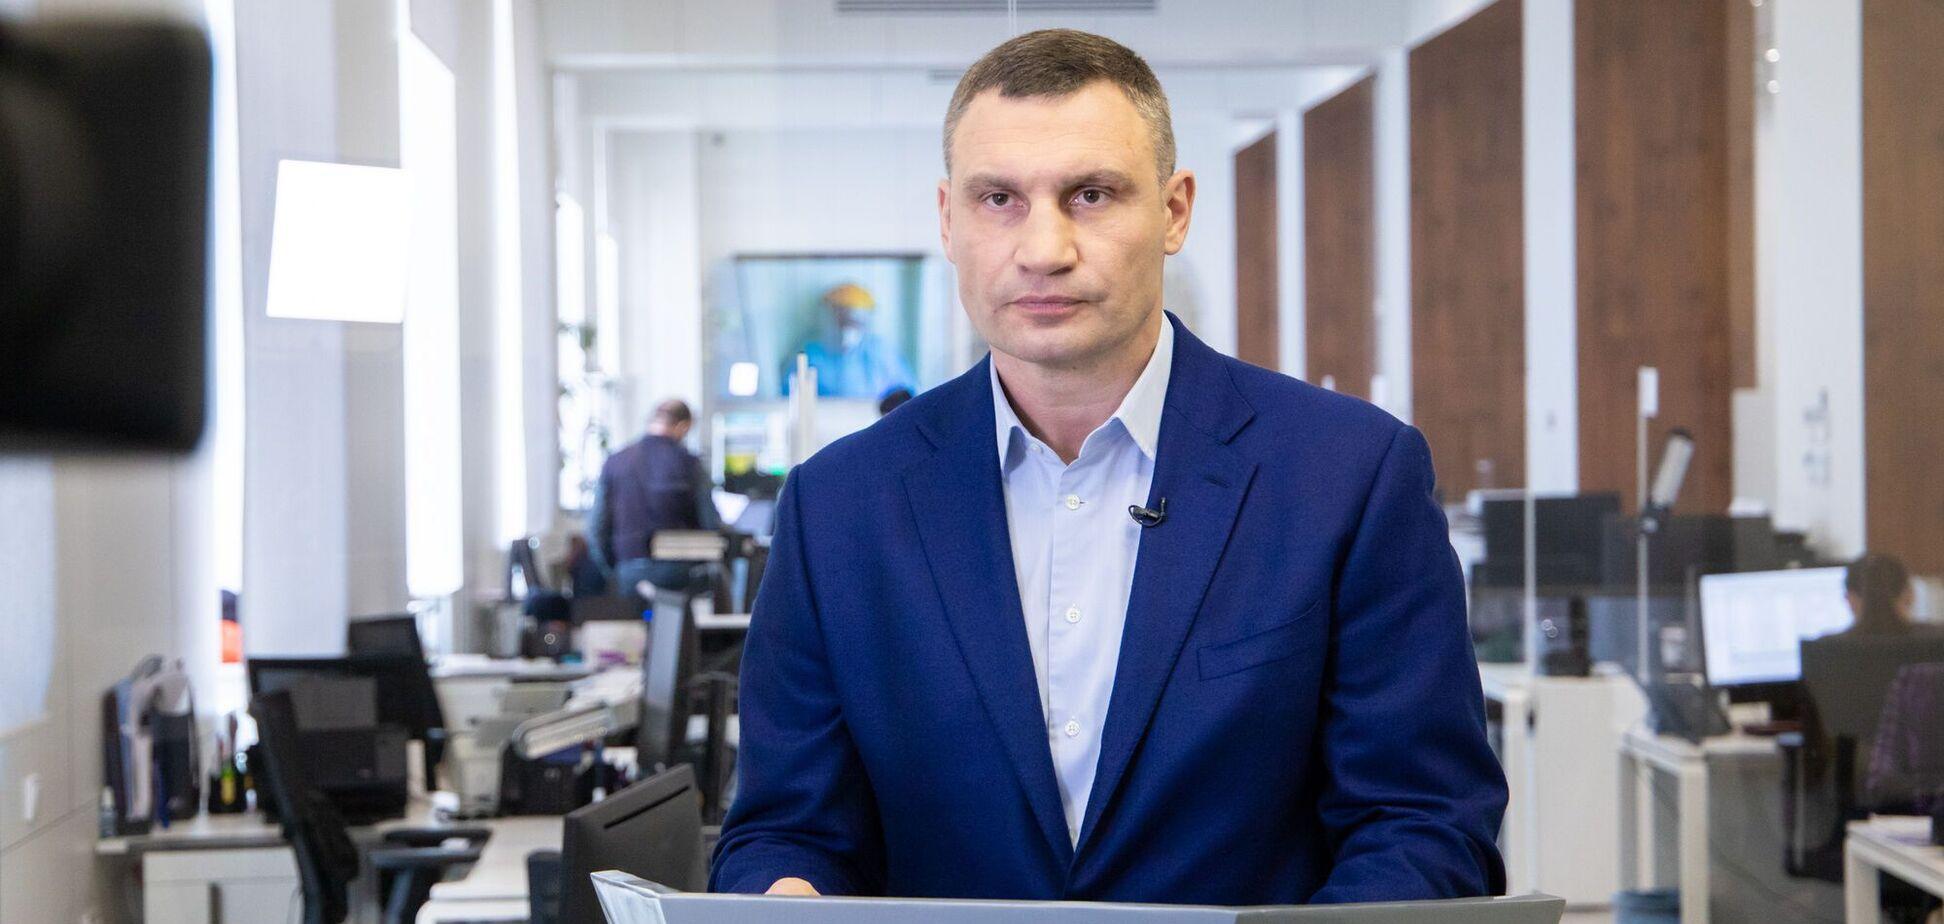 Мэр Киева анонсировал усиление карантина